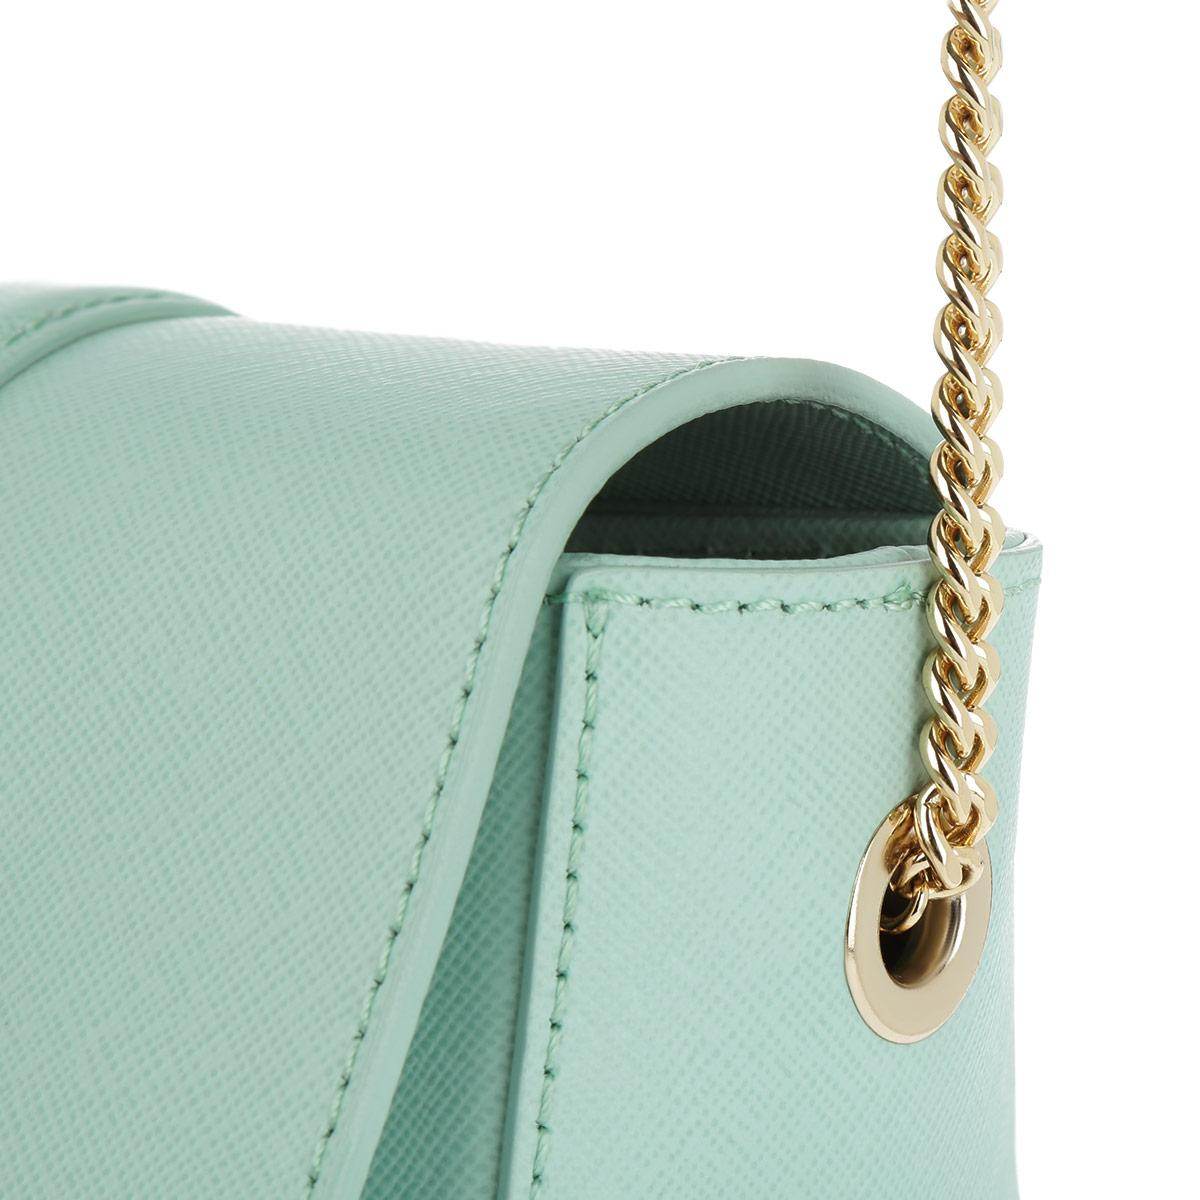 2dbe31bab5c Patrizia Pepe Crossbody Bag Pure Water in Green - Lyst